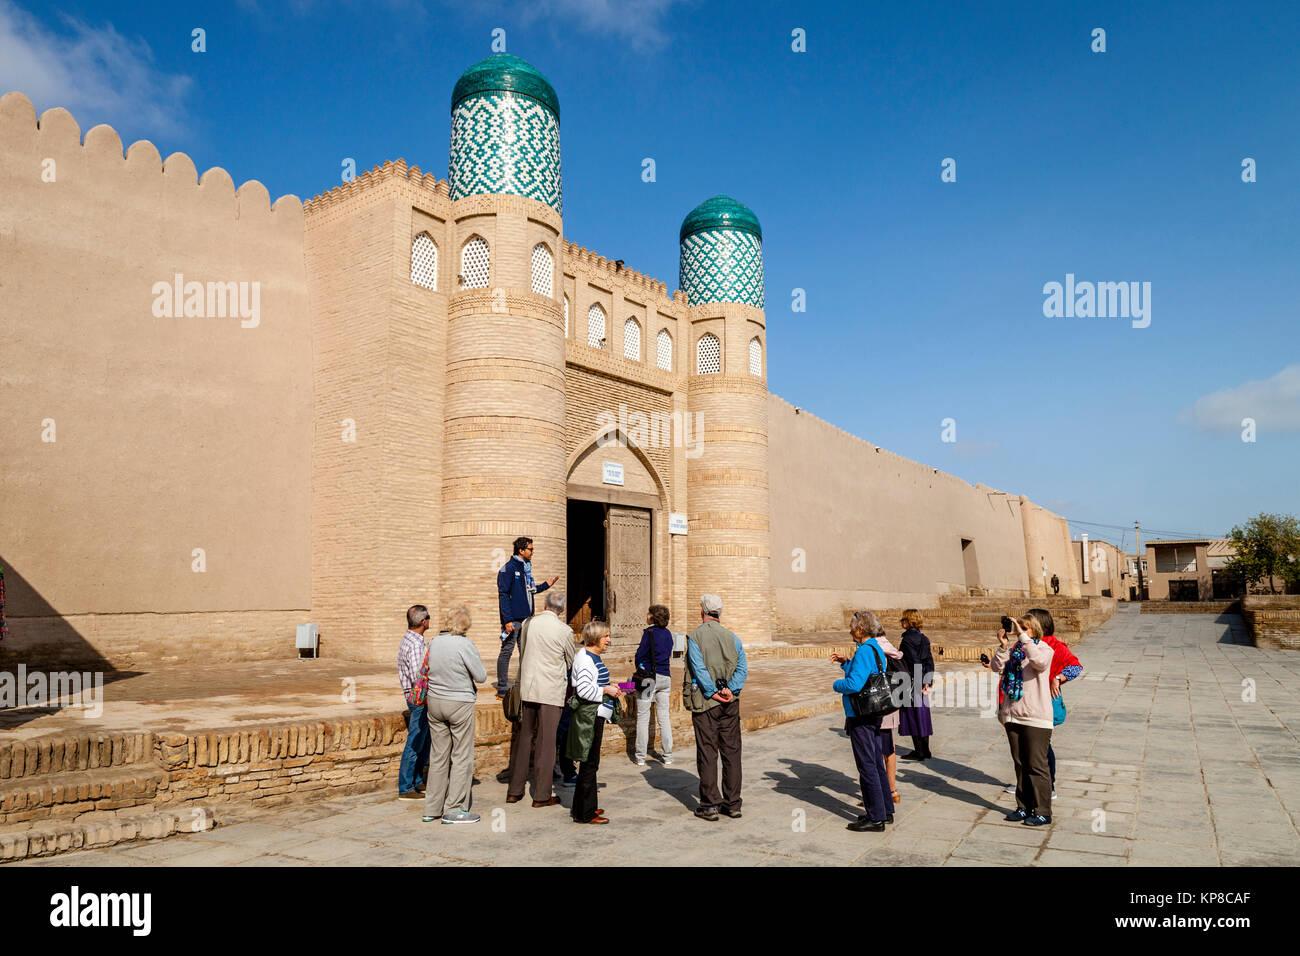 The Entrance To The Kunya Ark Fortress, Khiva, Uzbekistan - Stock Image